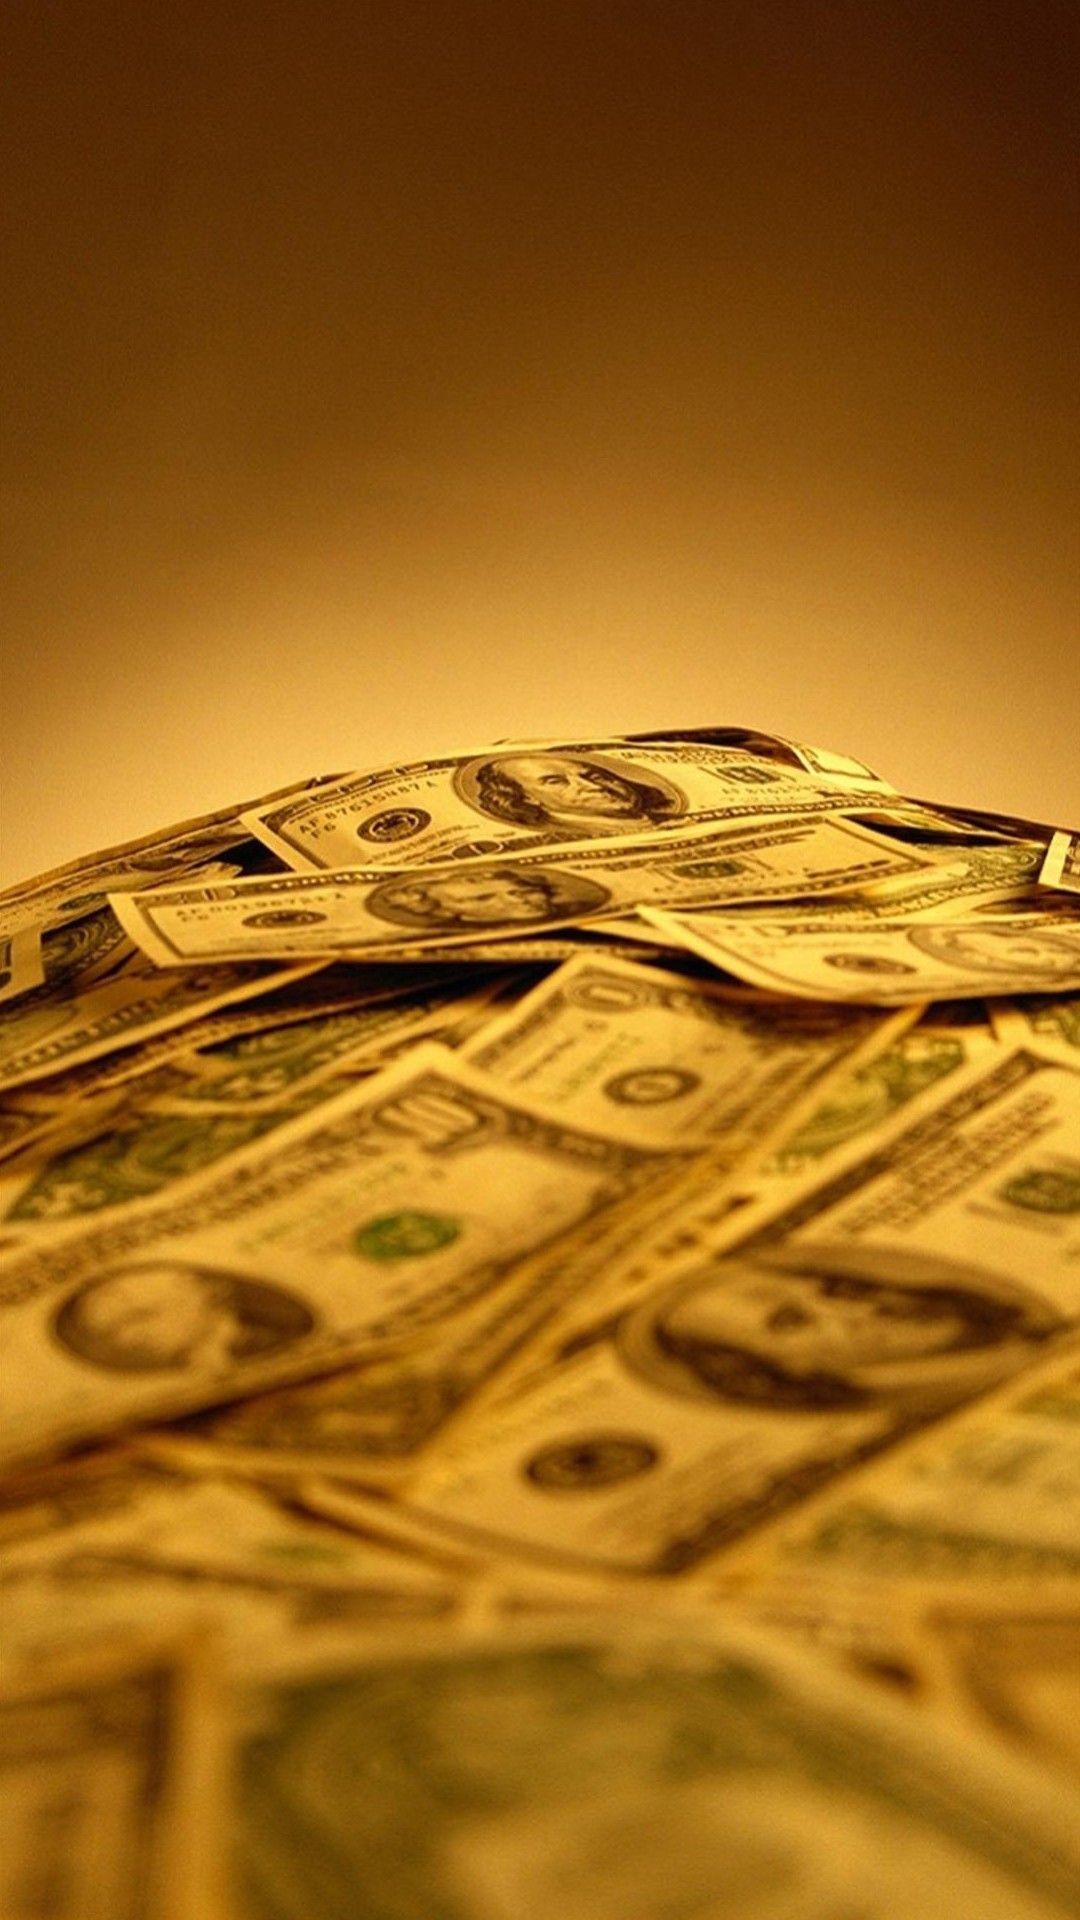 Pile Of Money Iphone Wallpaper Gold Money Wallpaper Money Wallpaper Iphone Dark Wallpaper Iphone